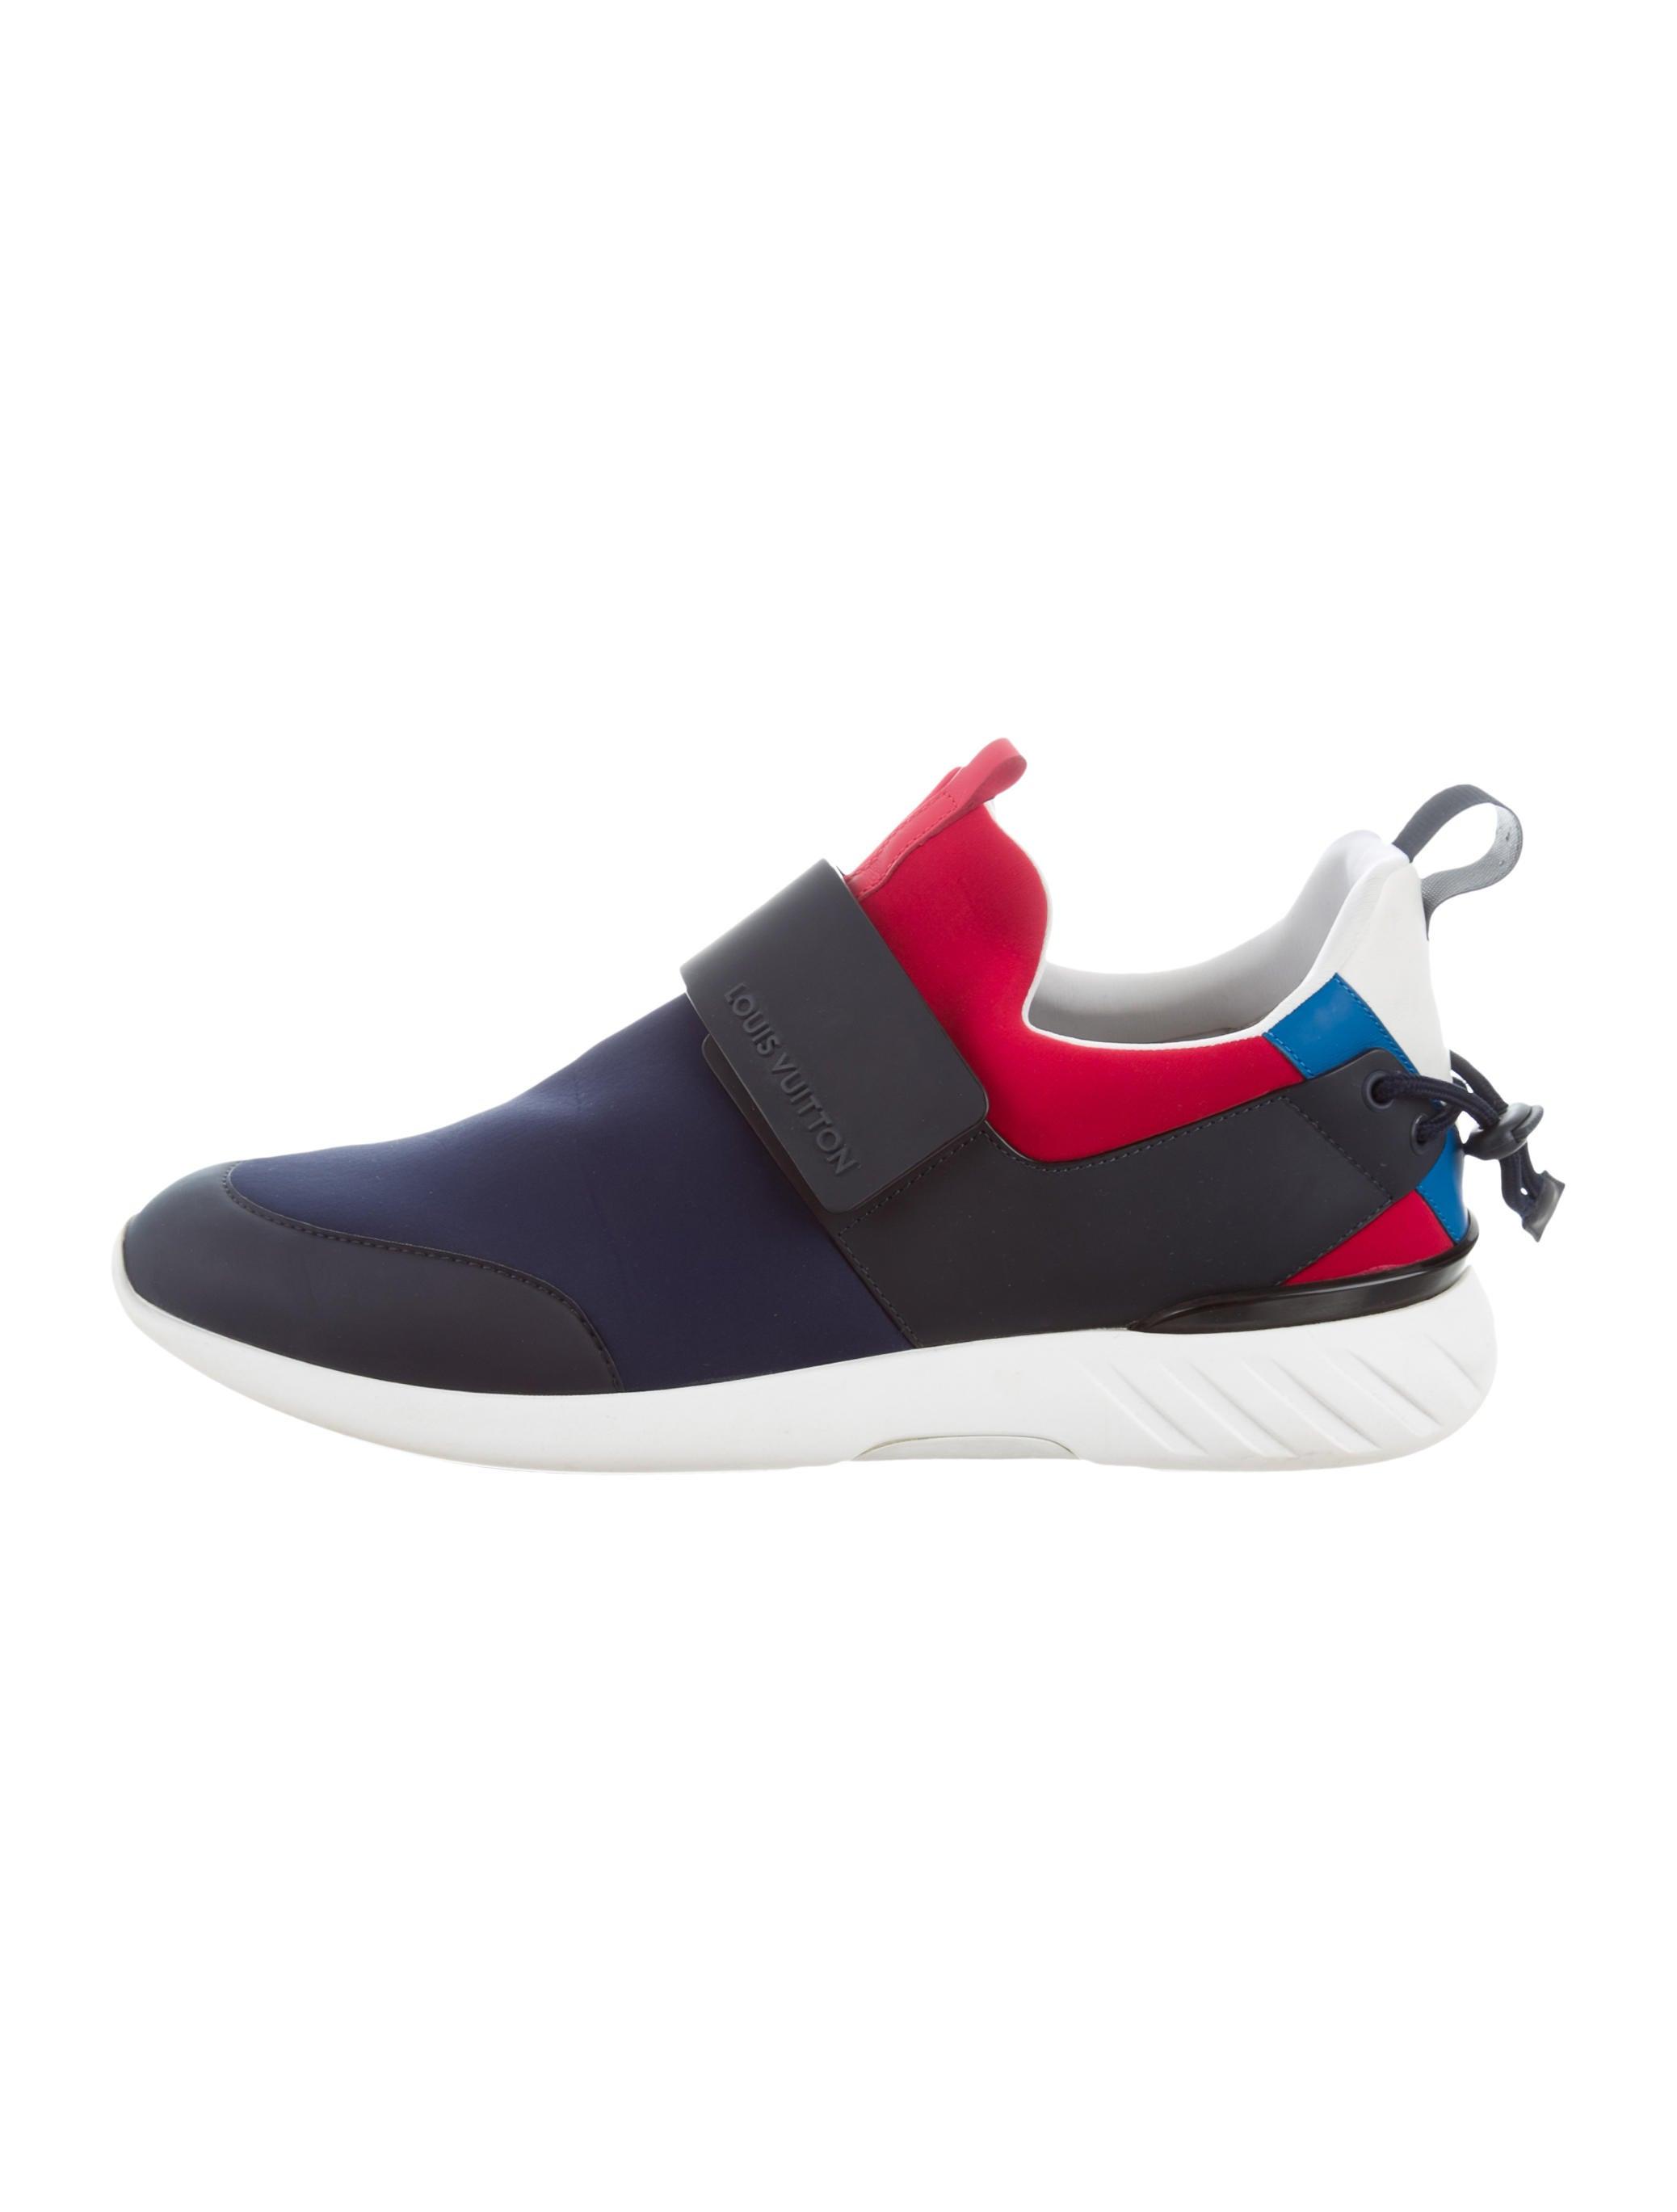 7cf7ad27479a Louis Vuitton America s Cup Regatta Sneakers - Shoes - LOU133217 ...